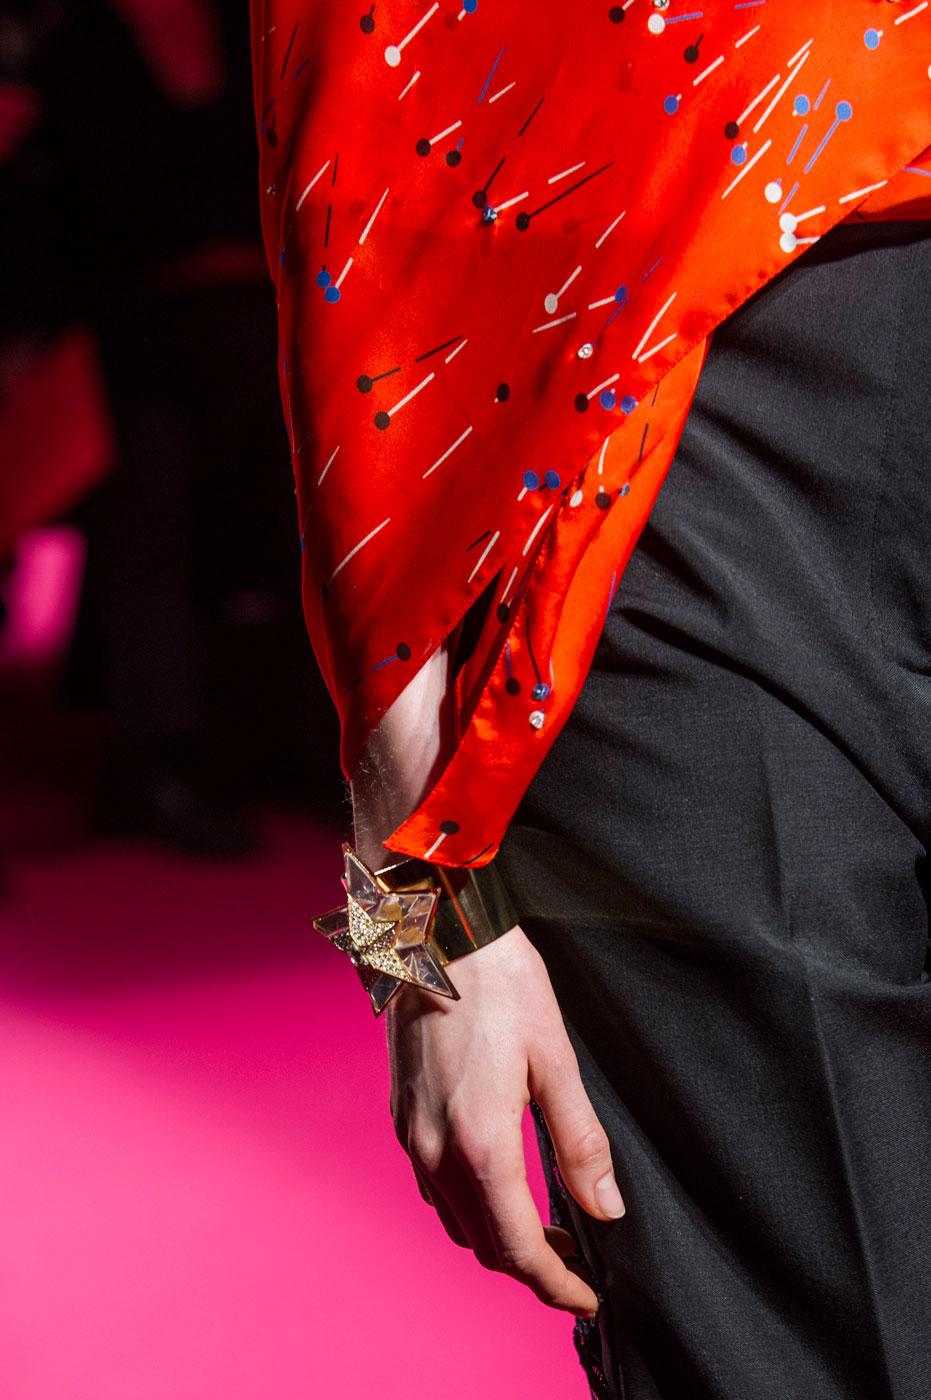 Schiaparelli-fashion-runway-show-close-ups-haute-couture-paris-spring-summer-2015-the-impression-49